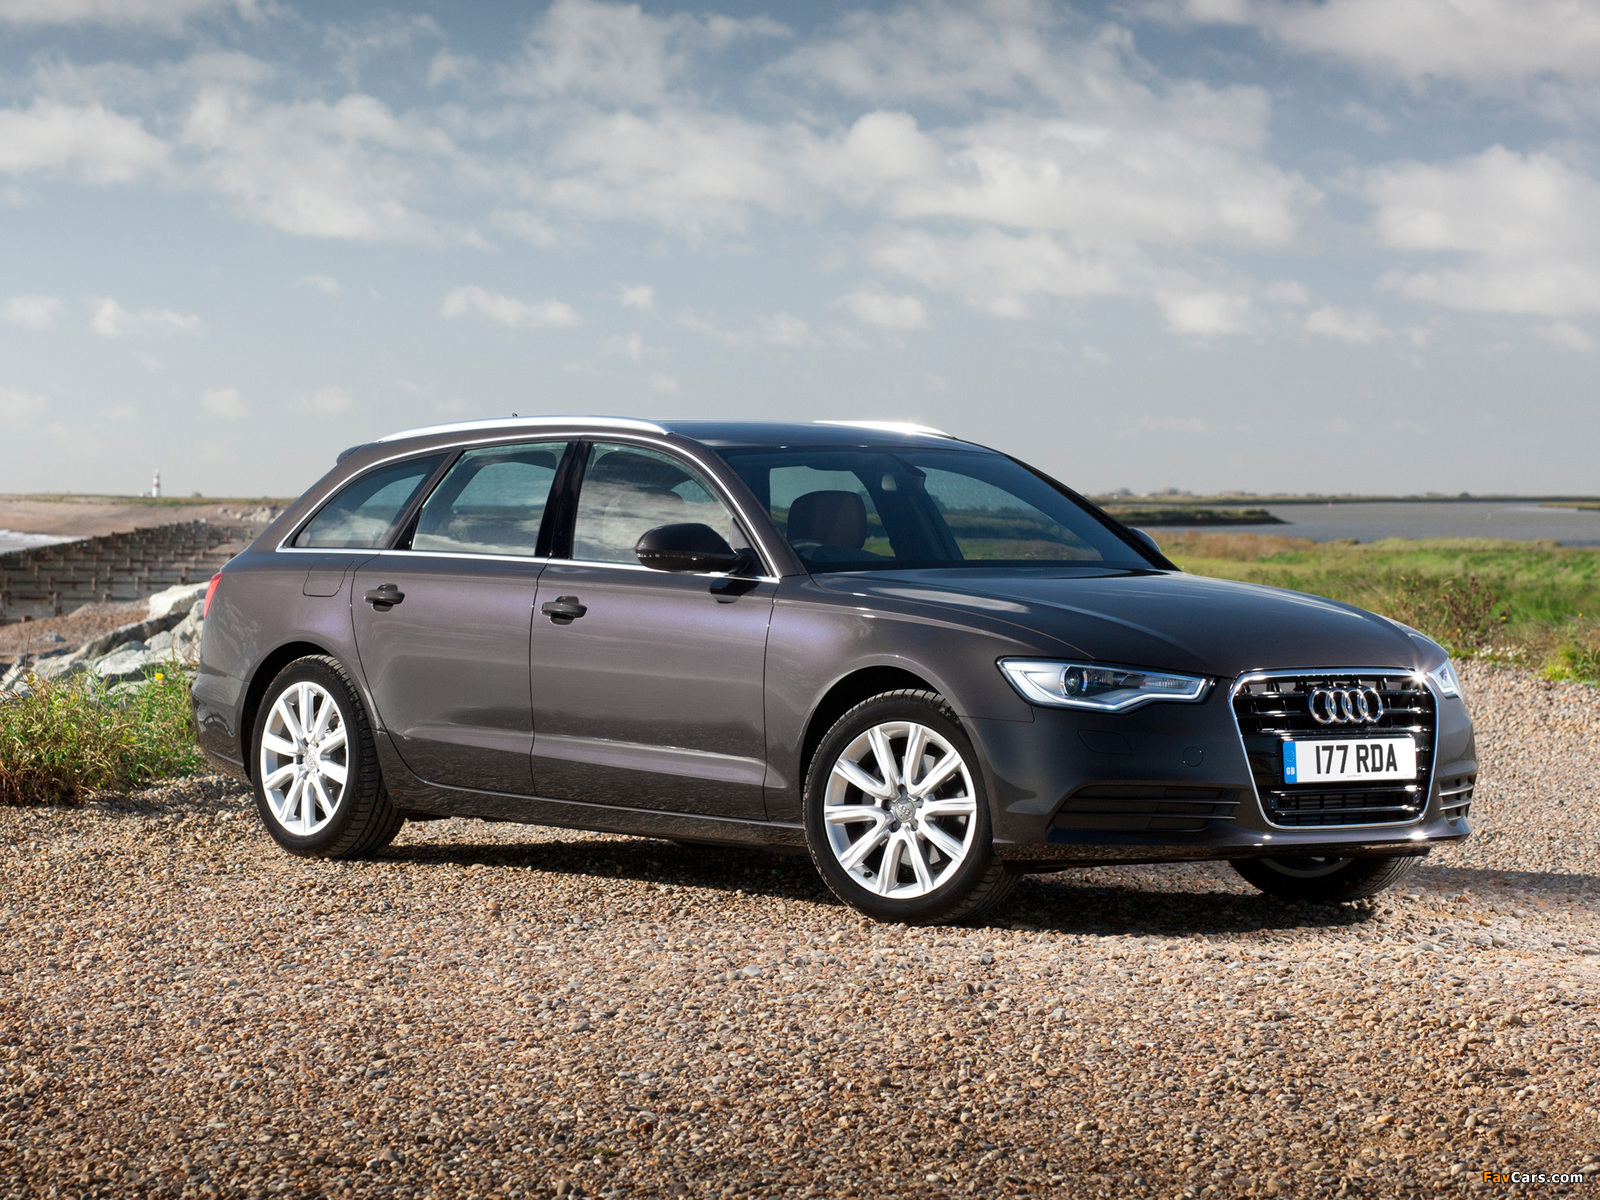 Audi A6 3 0 Tdi Avant Uk Spec 4g C7 2011 Wallpapers